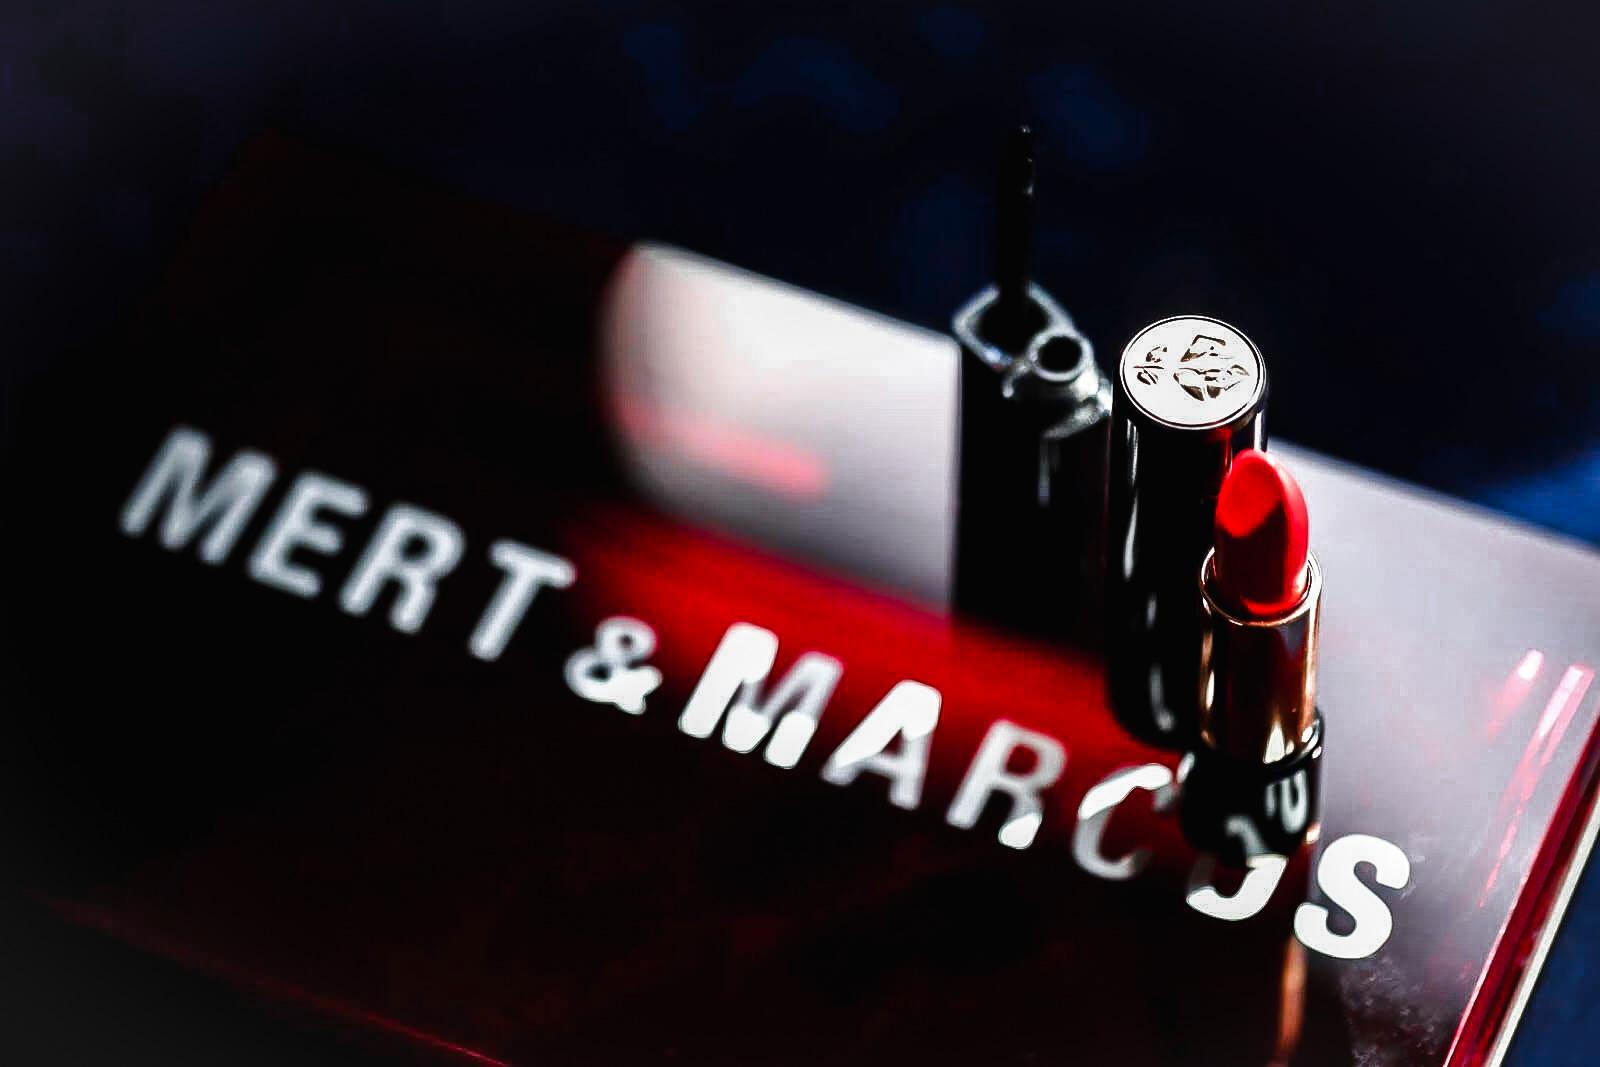 Lancôme Mert Marcus Maquillage avis